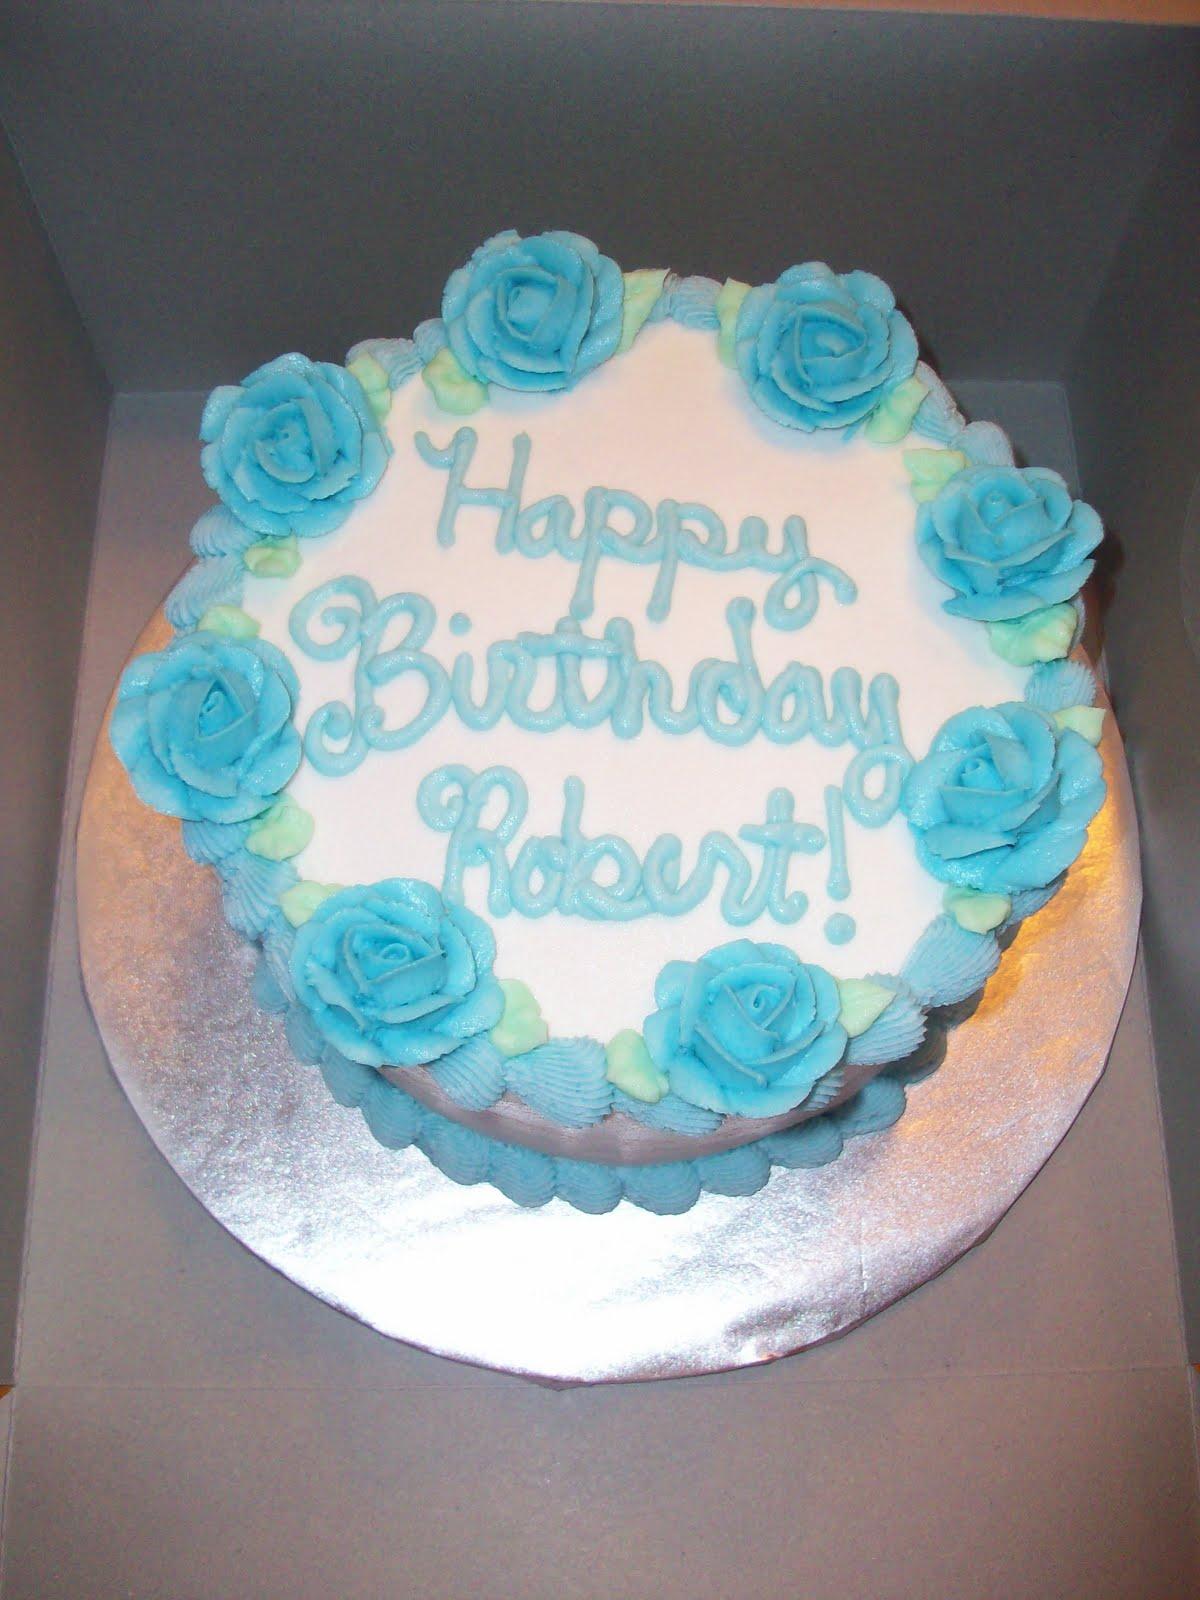 Sensational Cake Decorations Simple Decorating Cake Ideas Funny Birthday Cards Online Fluifree Goldxyz